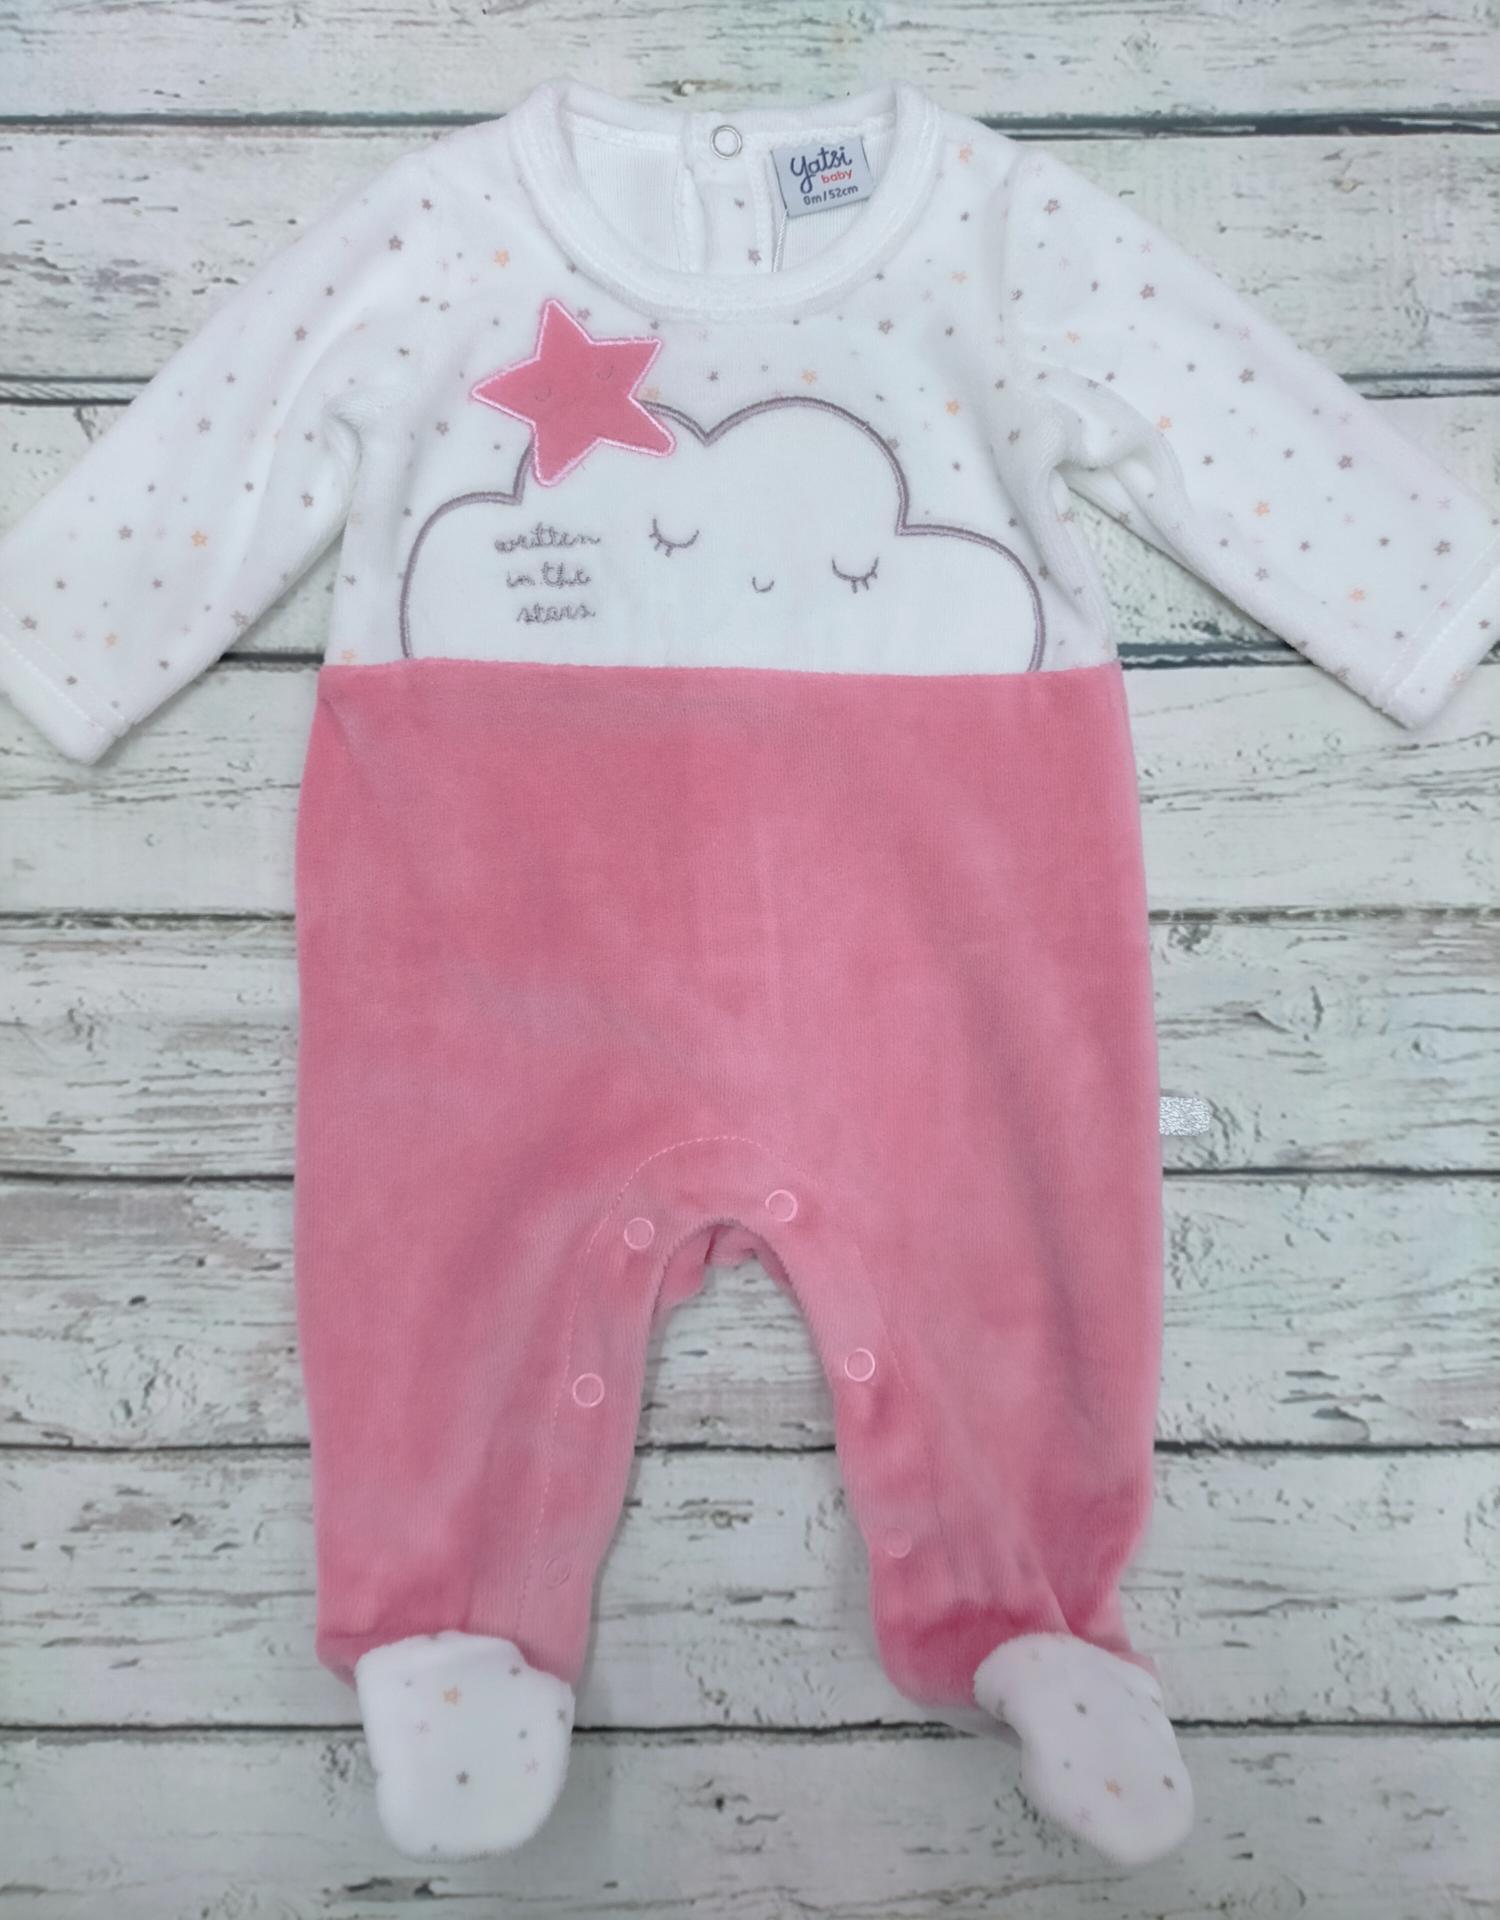 Pijama bebé niña Nube de Yatsi.